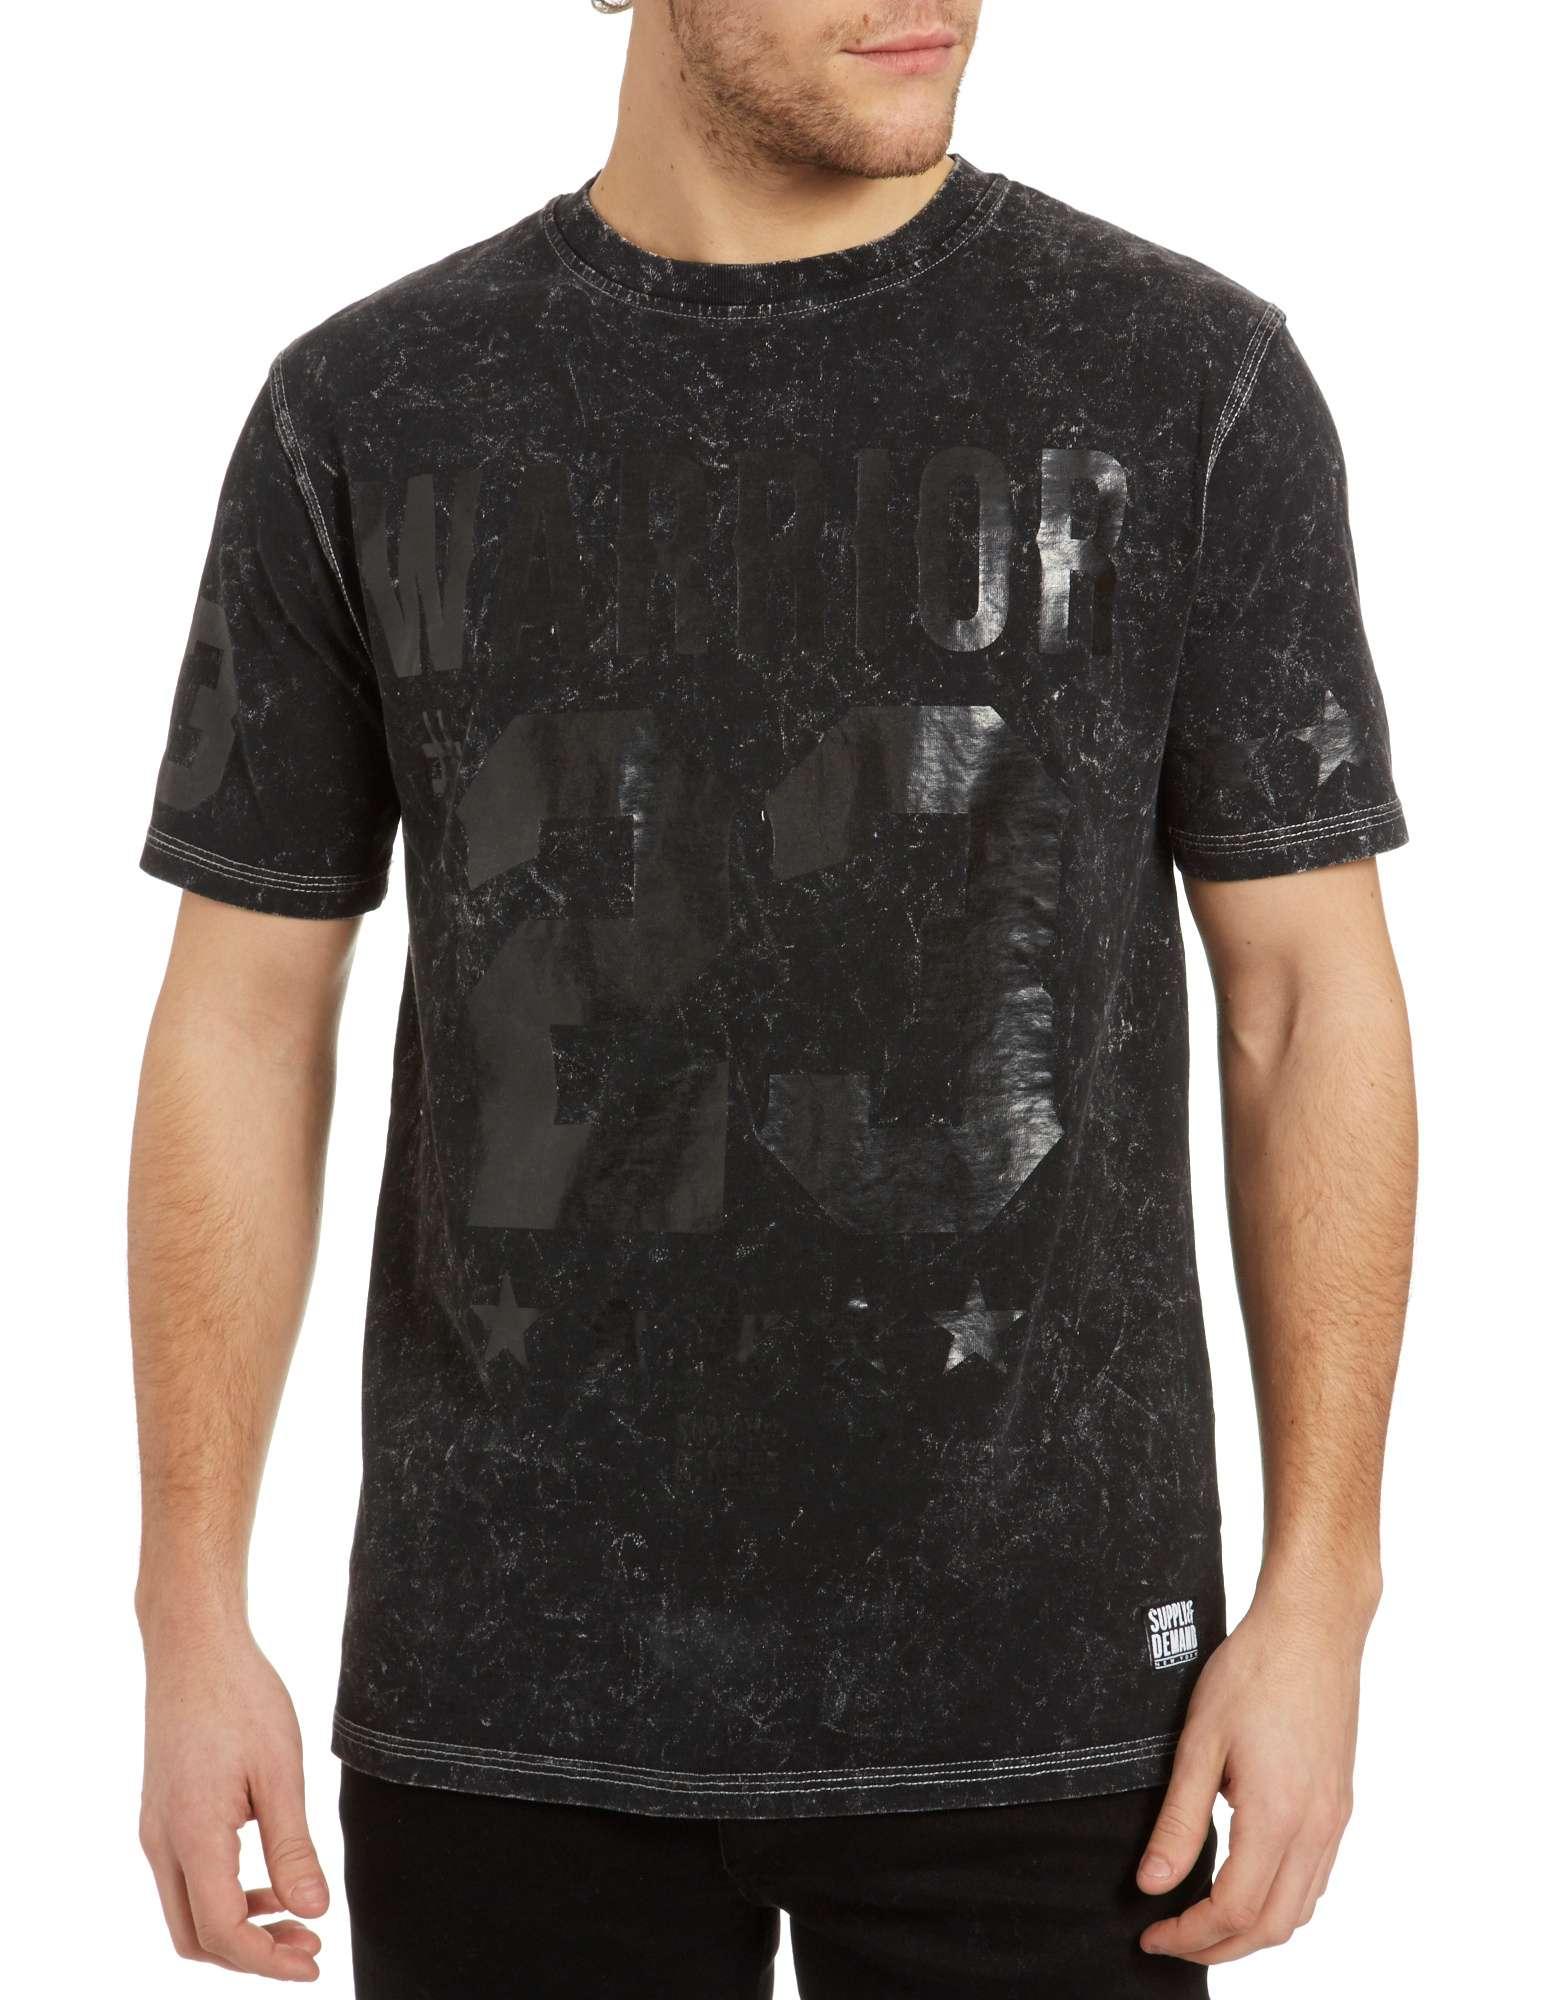 Supply & Demand Warrior Acid T-Shirt